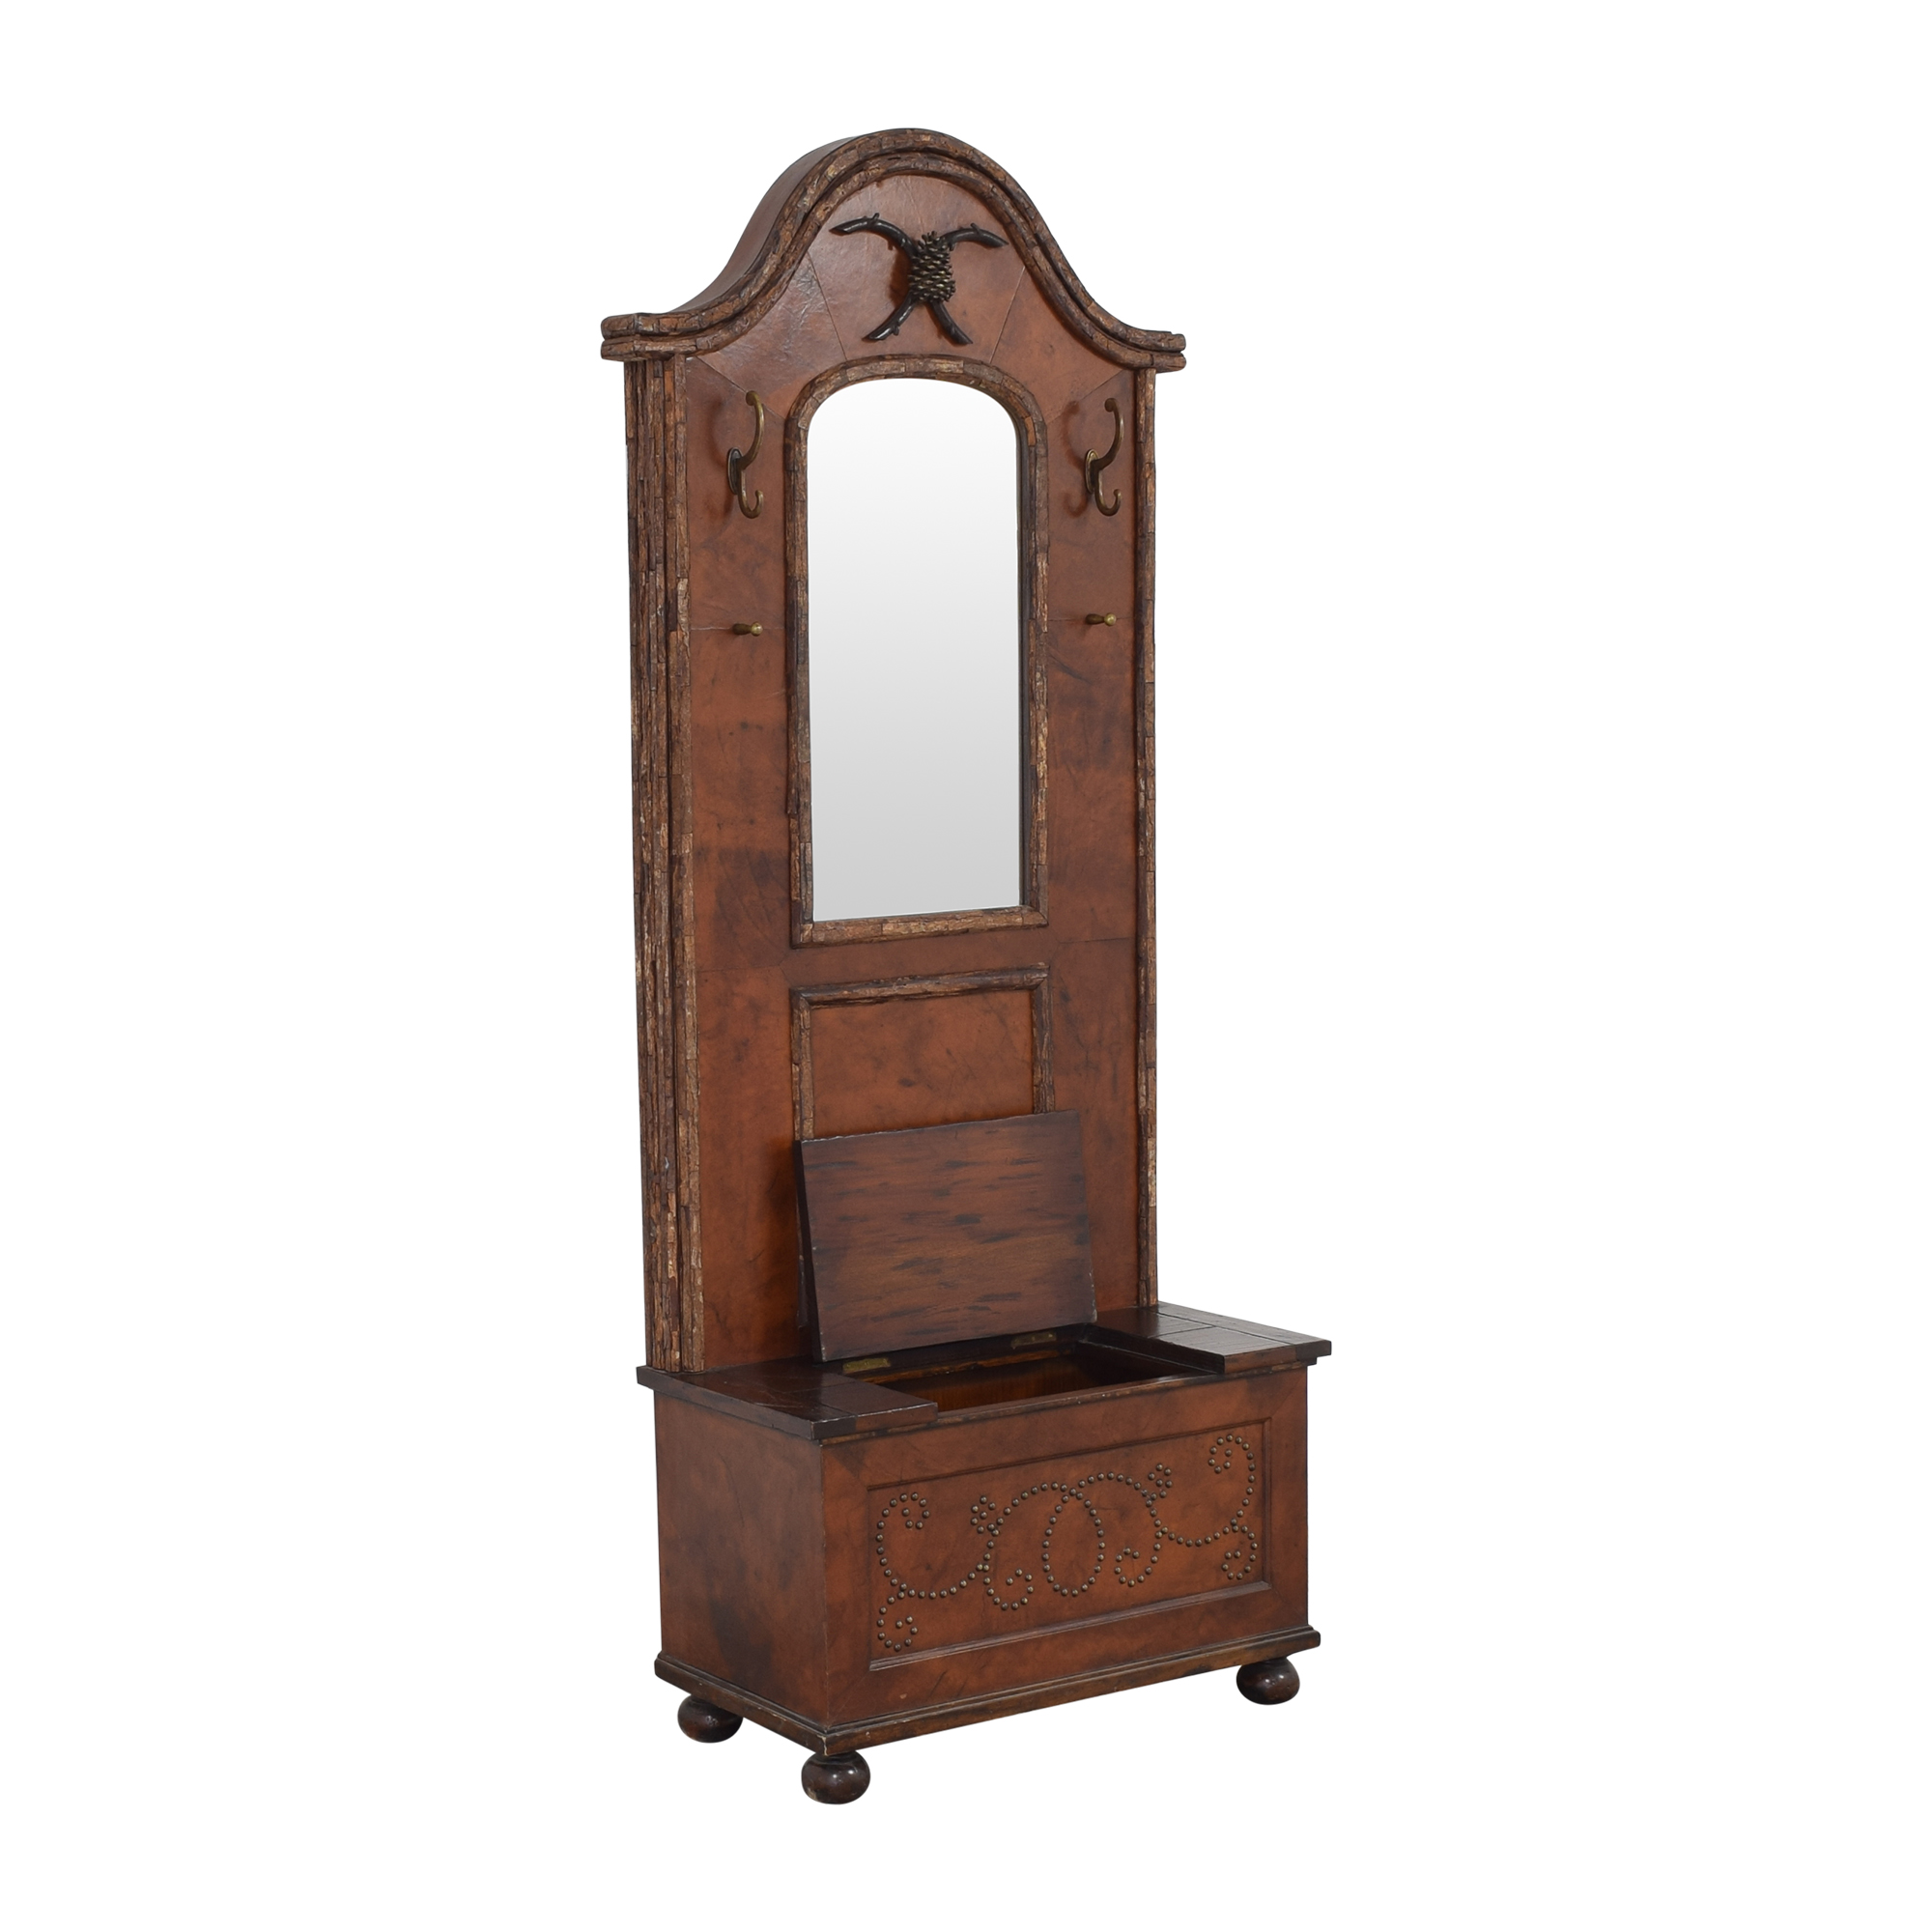 Drexel Heritage Drexel Heritage Equestrian's Hall Tree Cabinets & Sideboards